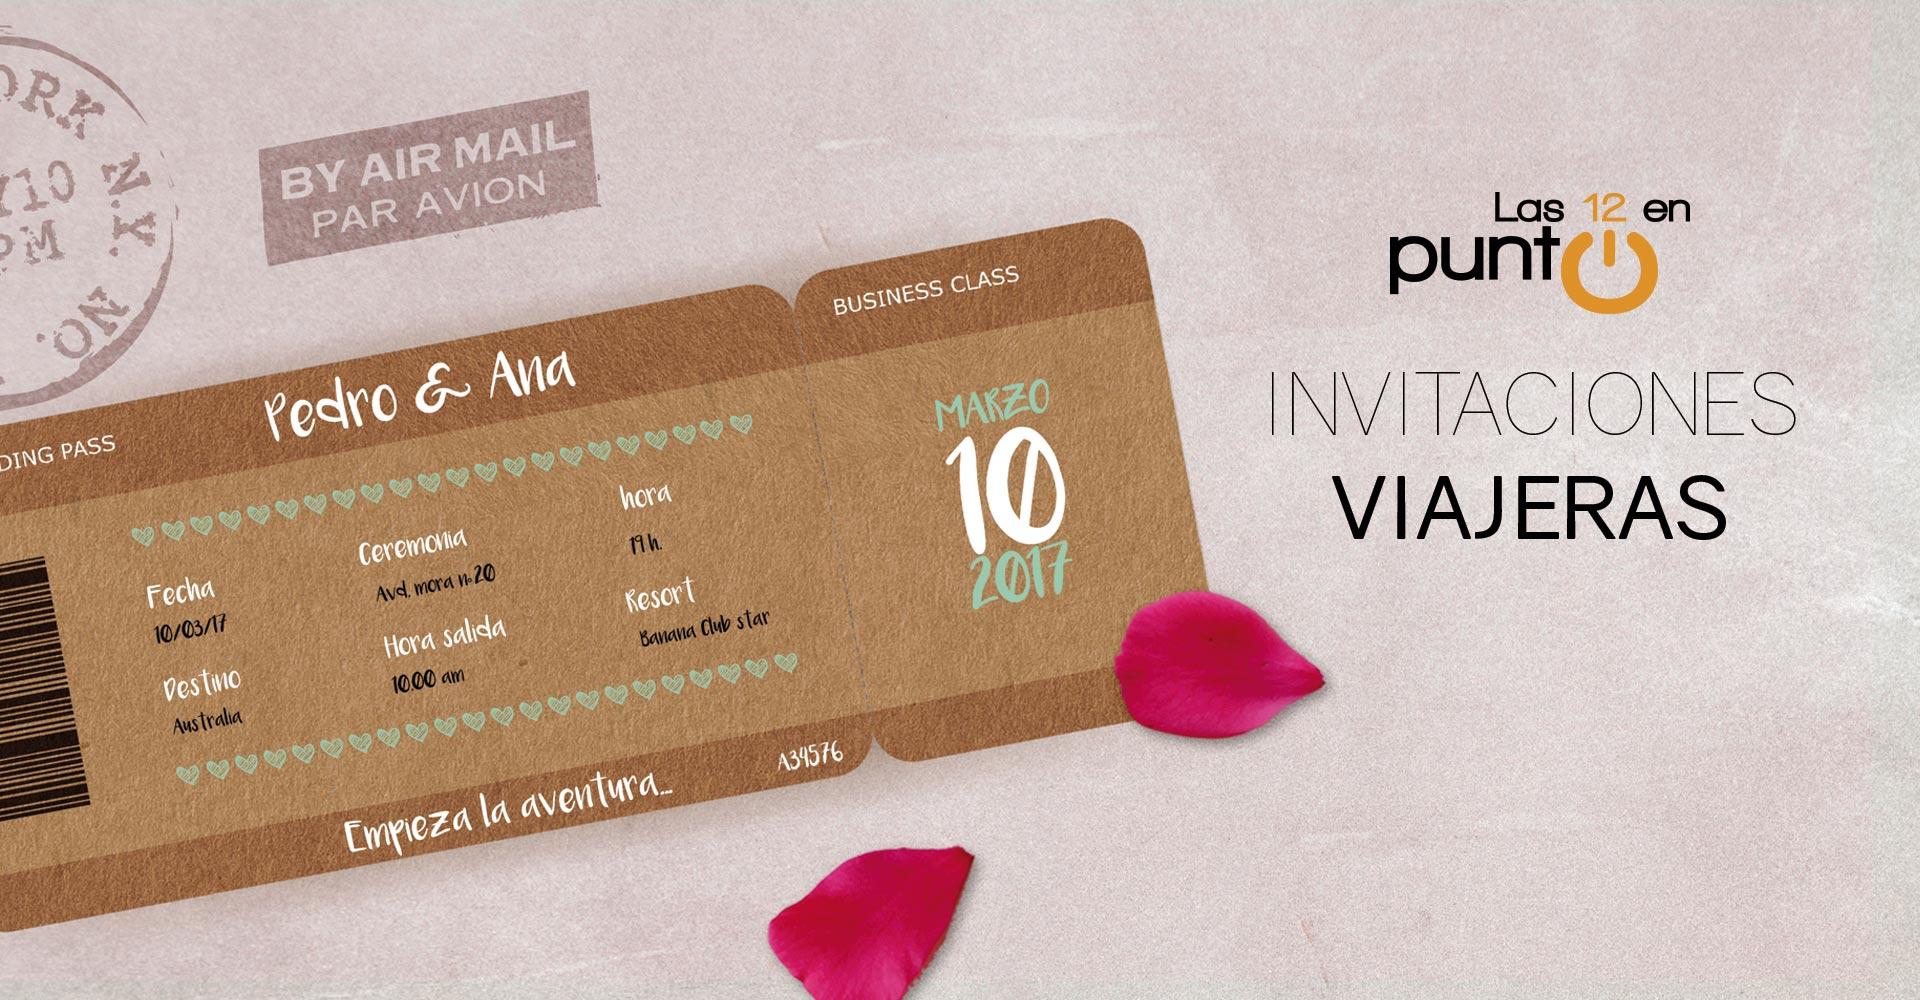 Invitación boda pasaporte | Las 12 en Punto